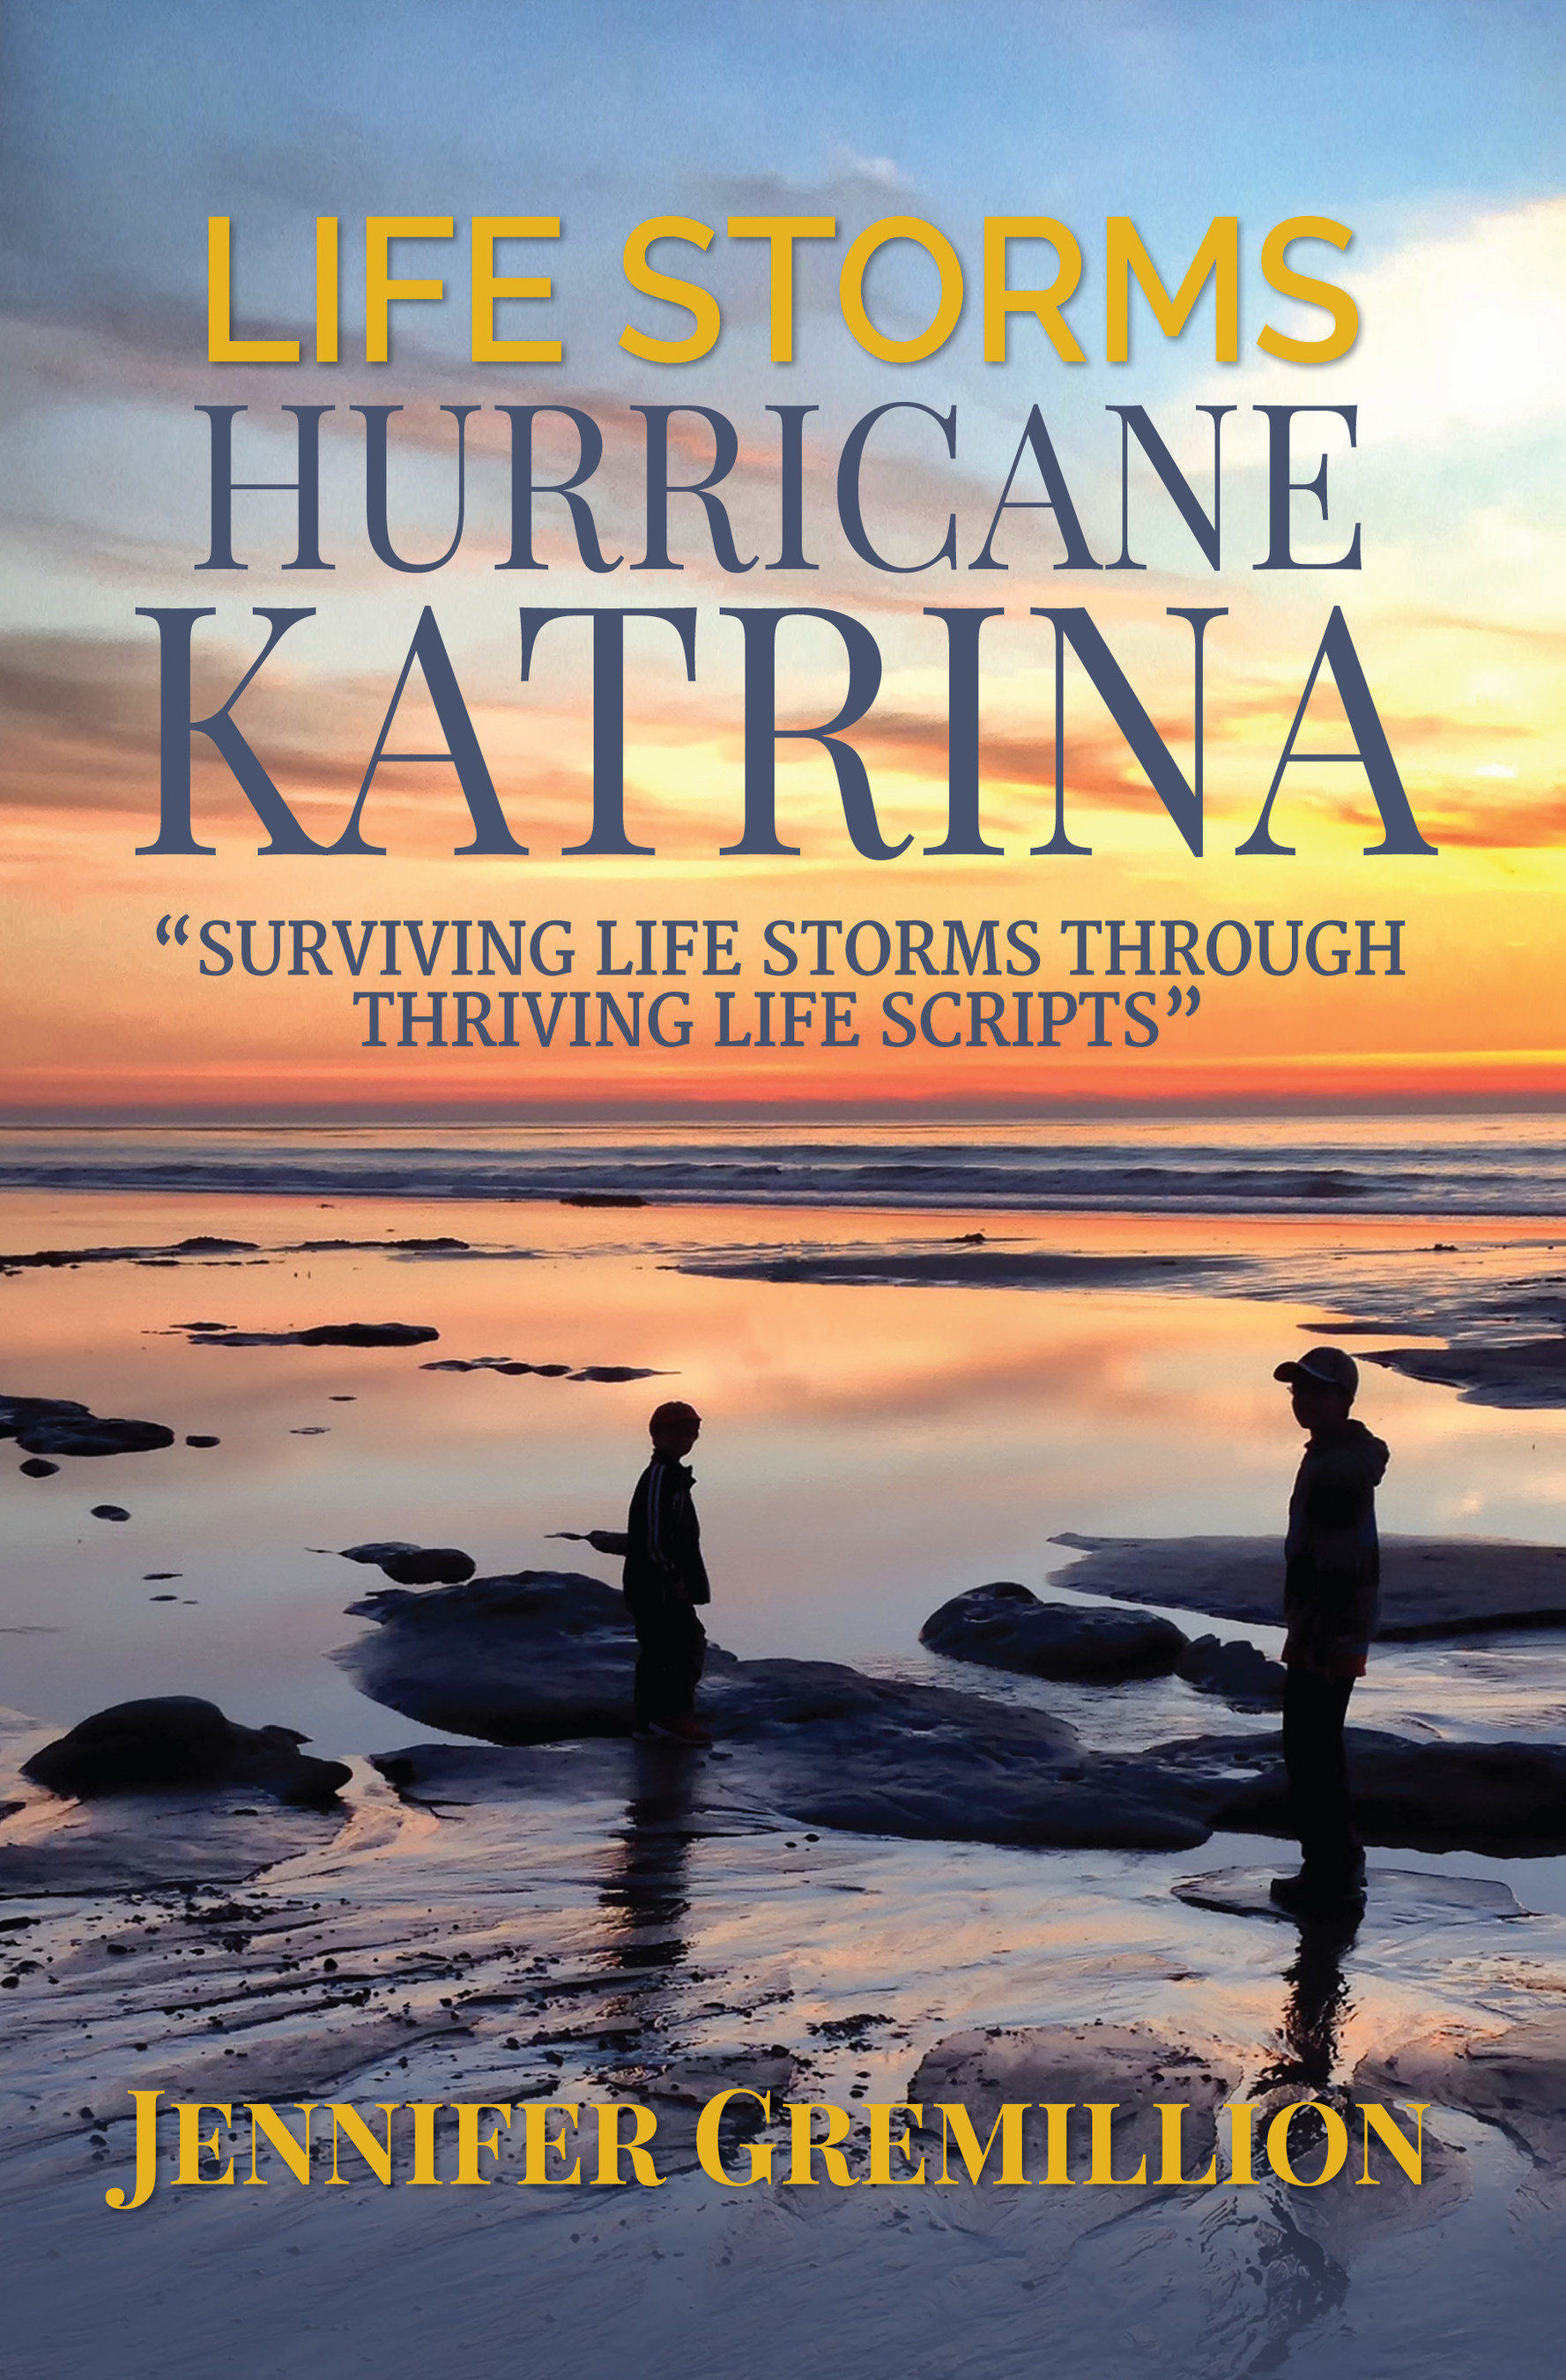 Hurricane Katrina Survivor Jennifer Gremillion Launches 'Life Storms: Hurricane Katrina' Book